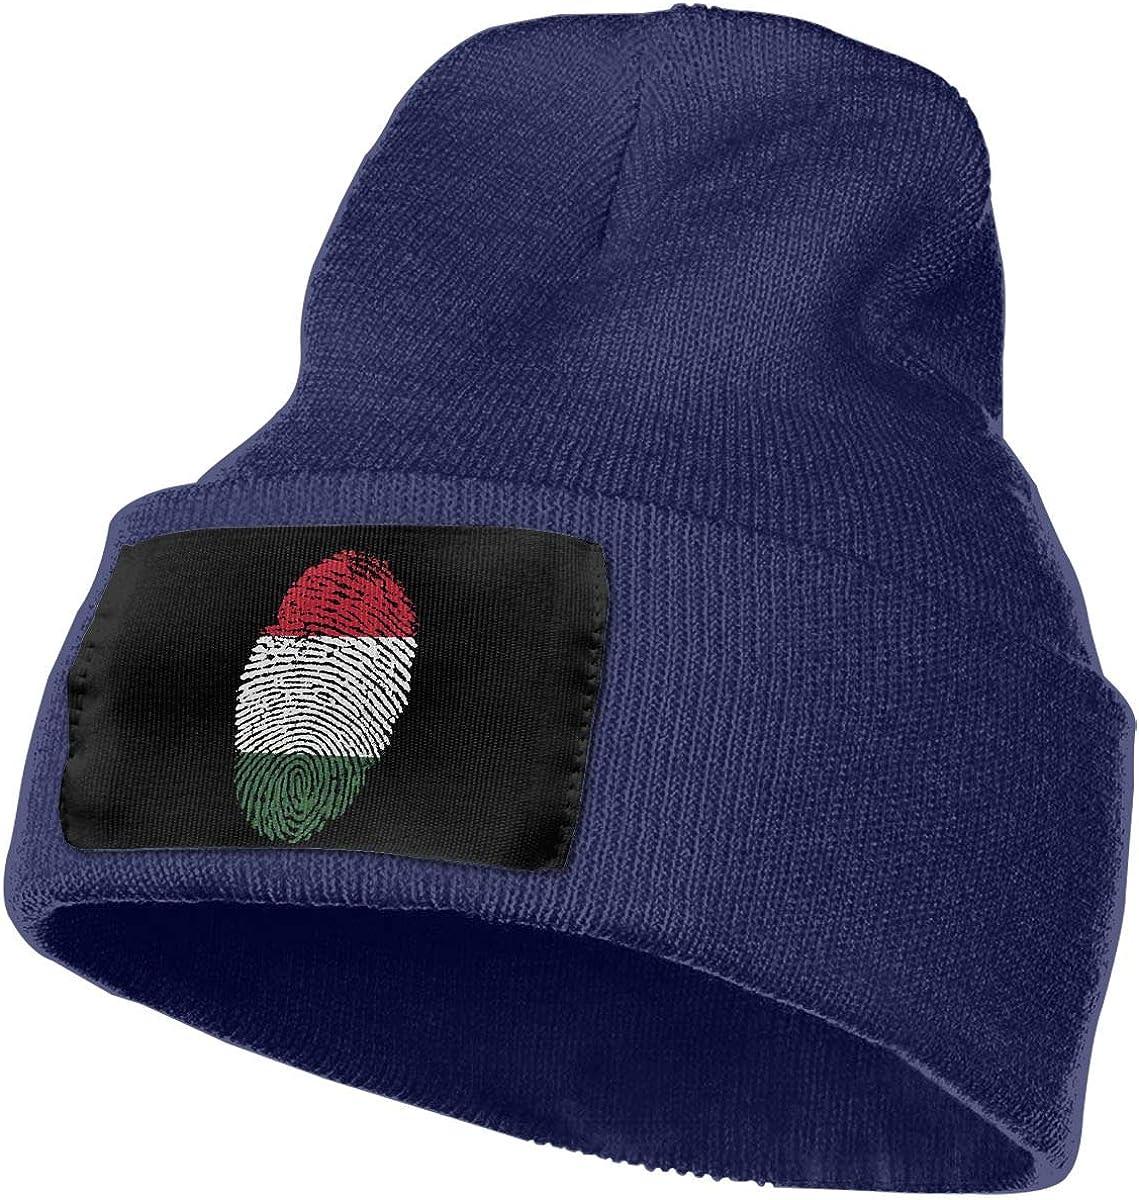 SLADDD1 Pug Warm Winter Hat Knit Beanie Skull Cap Cuff Beanie Hat Winter Hats for Men /& Women